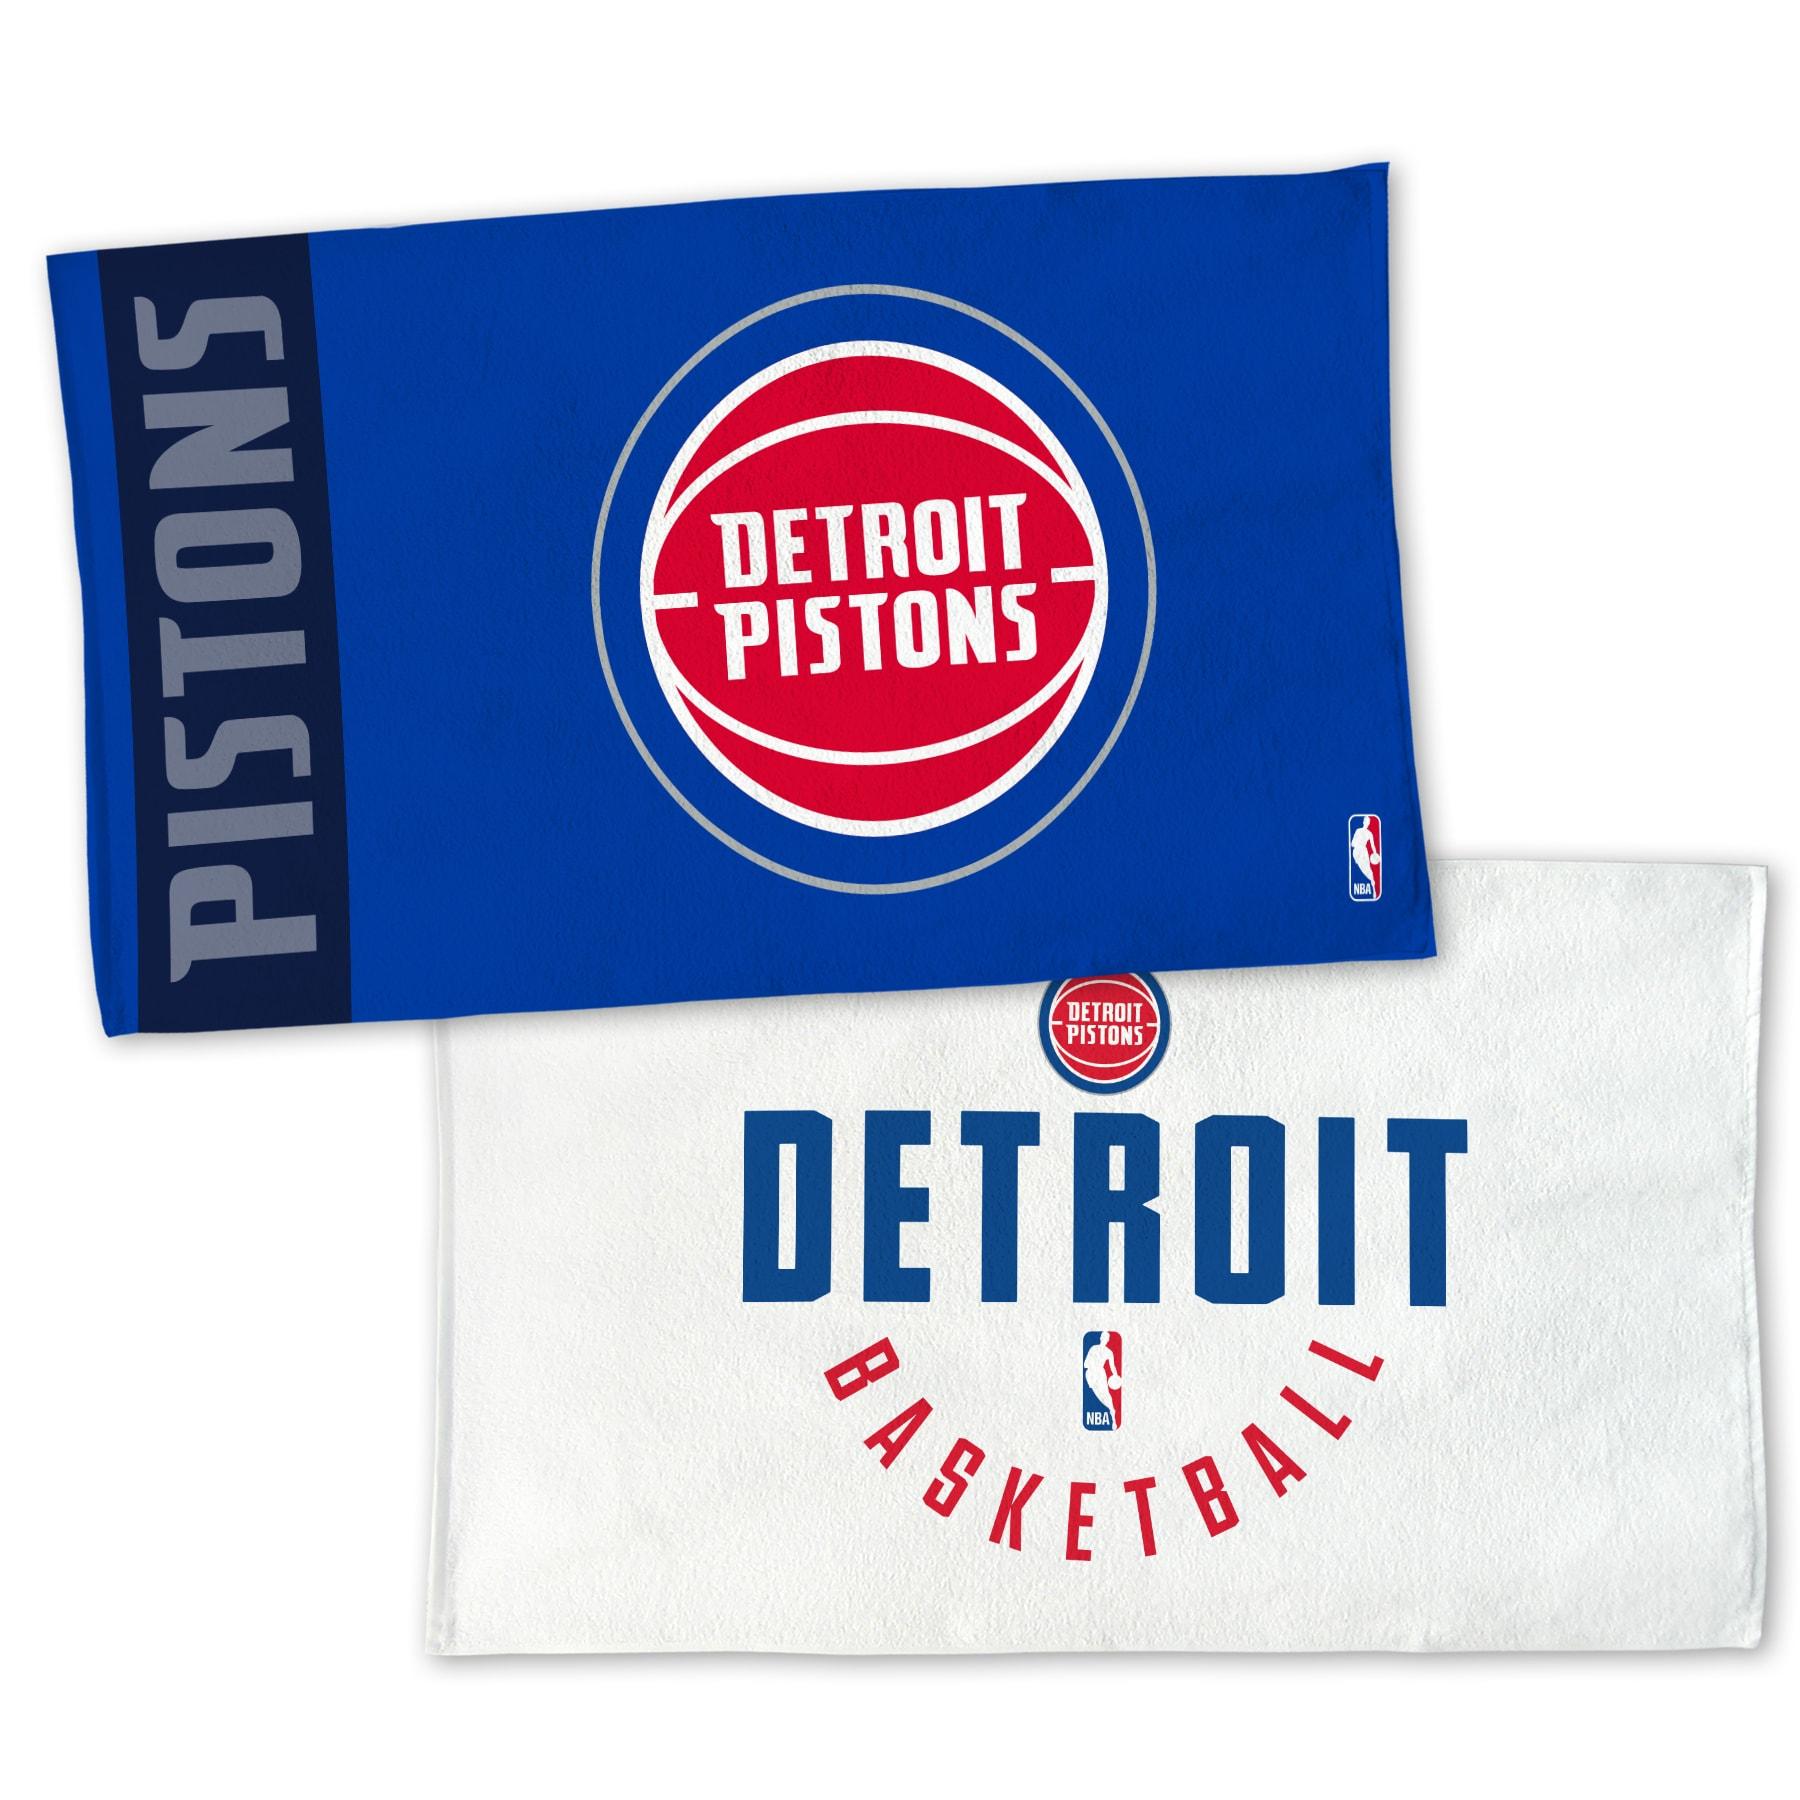 "Detroit Pistons WinCraft 22"" x 42"" Authentic On-Court Towel"